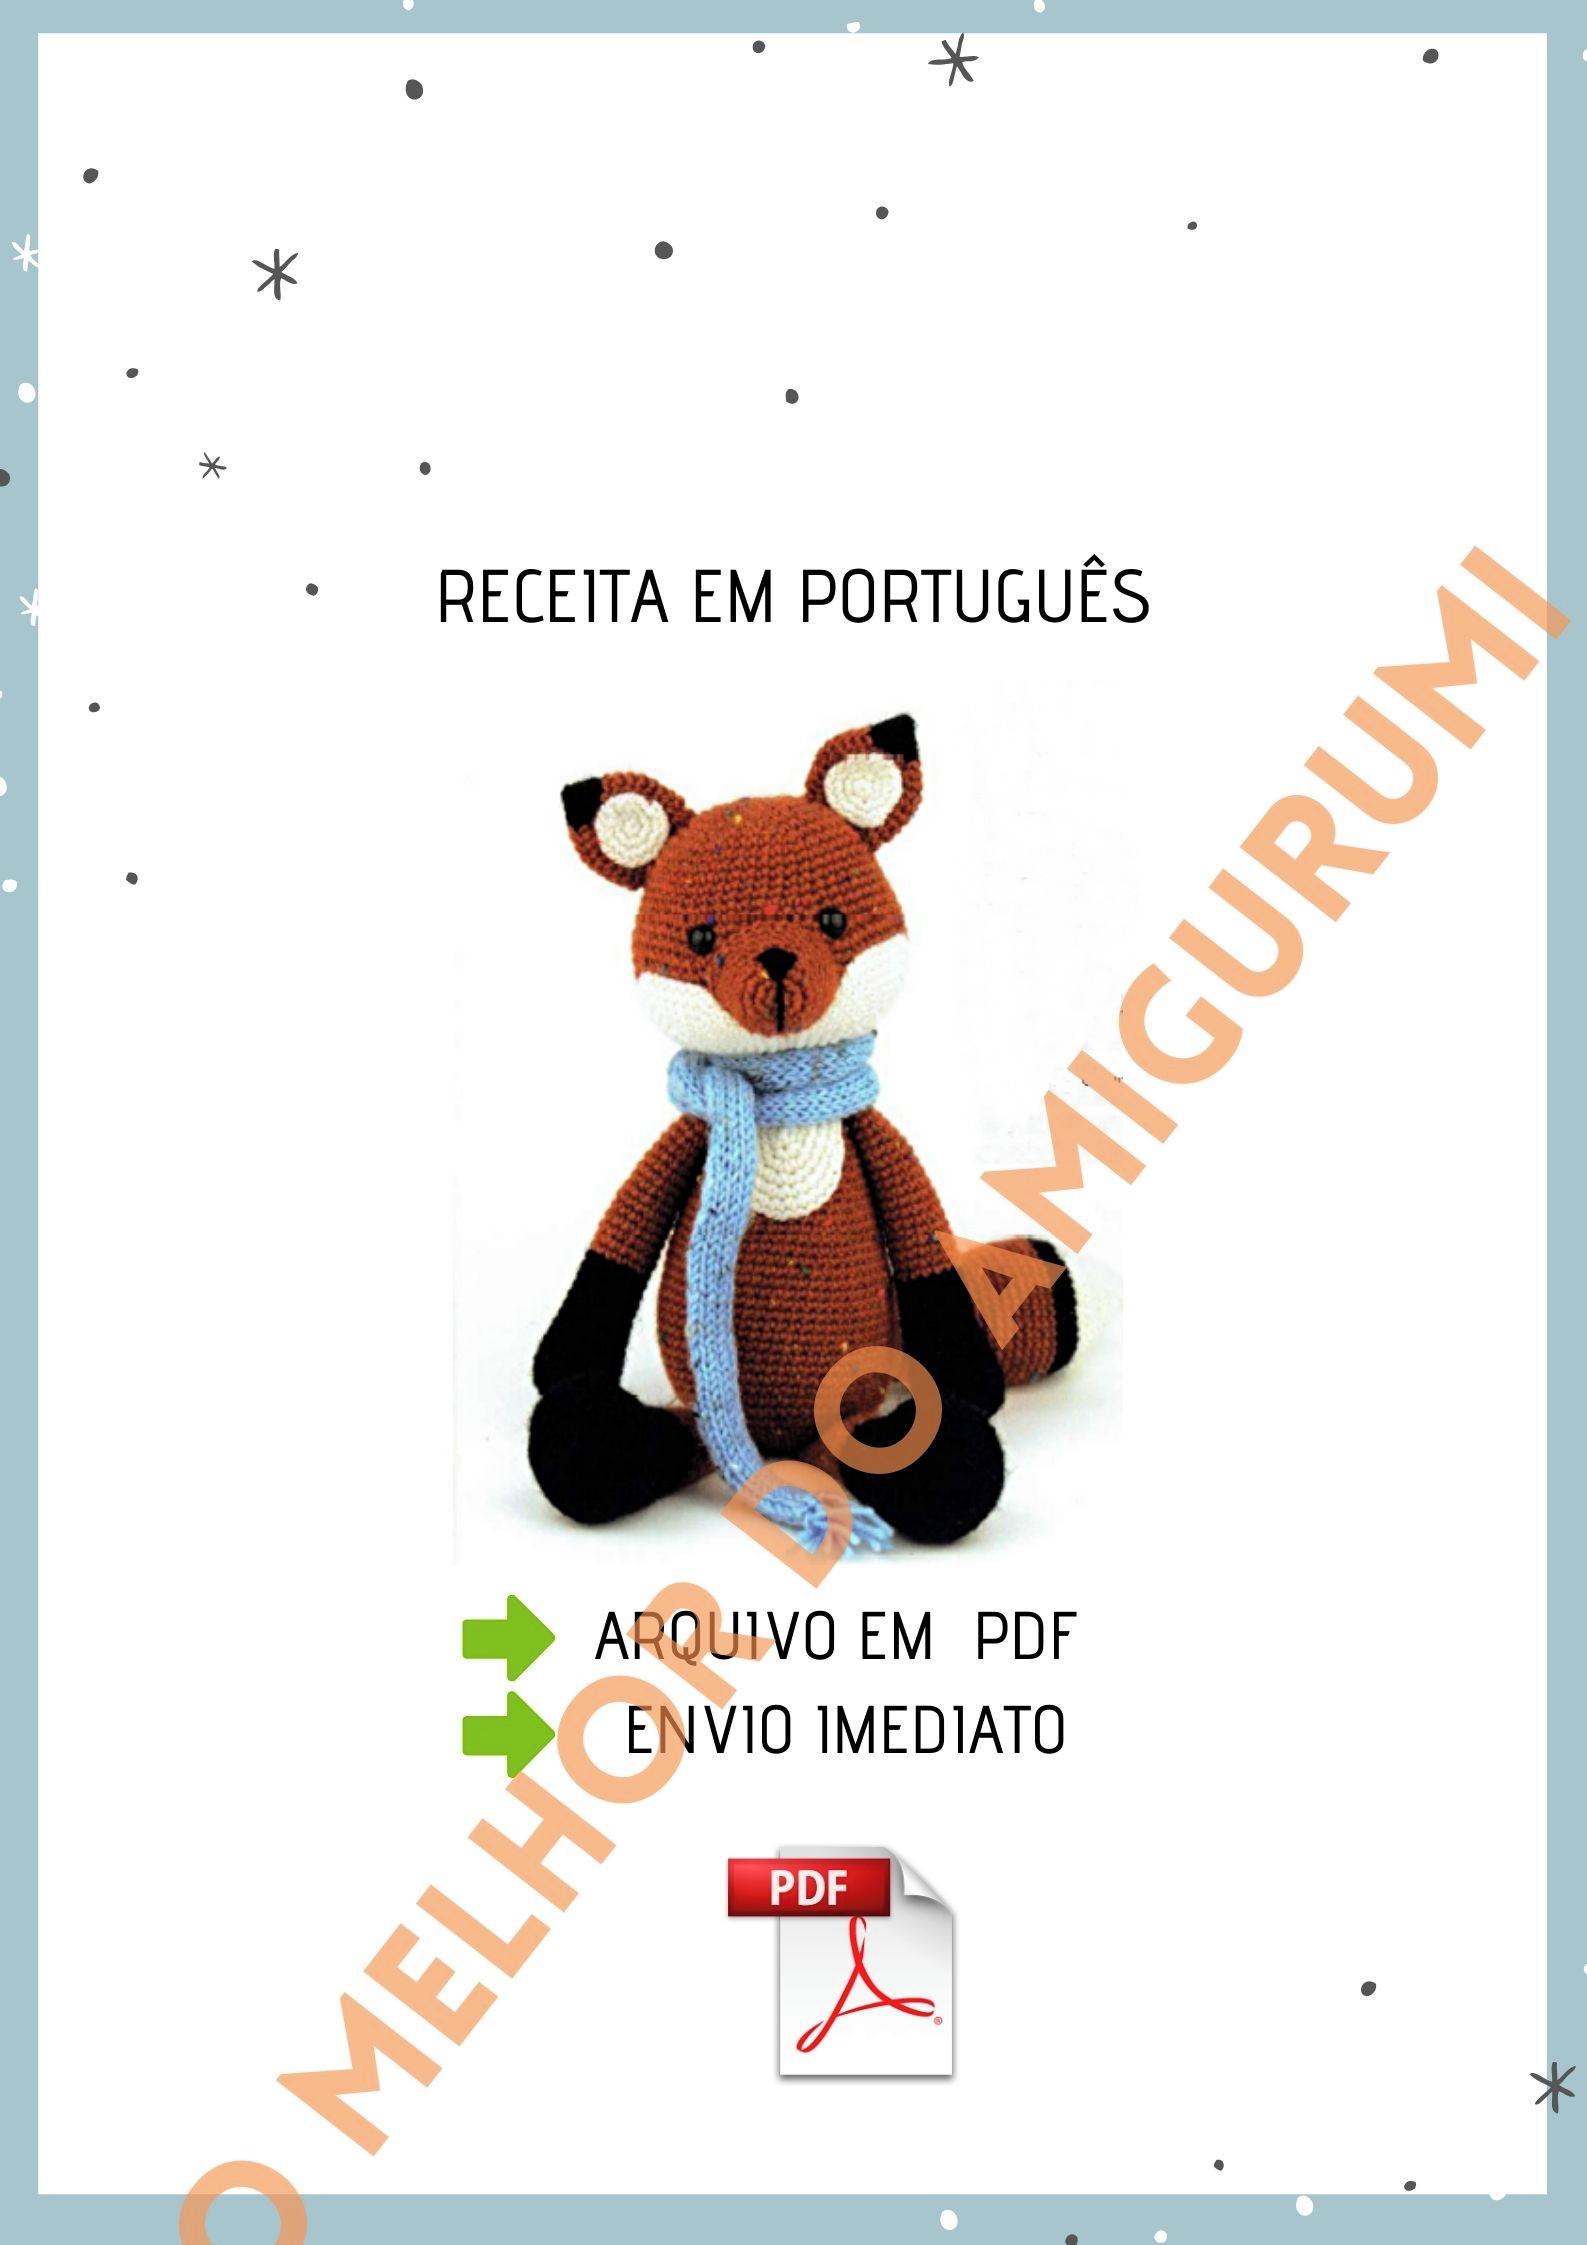 Urso cachecol | Little Things Amigurumis | Talk7 | Urso, Animais ... | 2245x1587